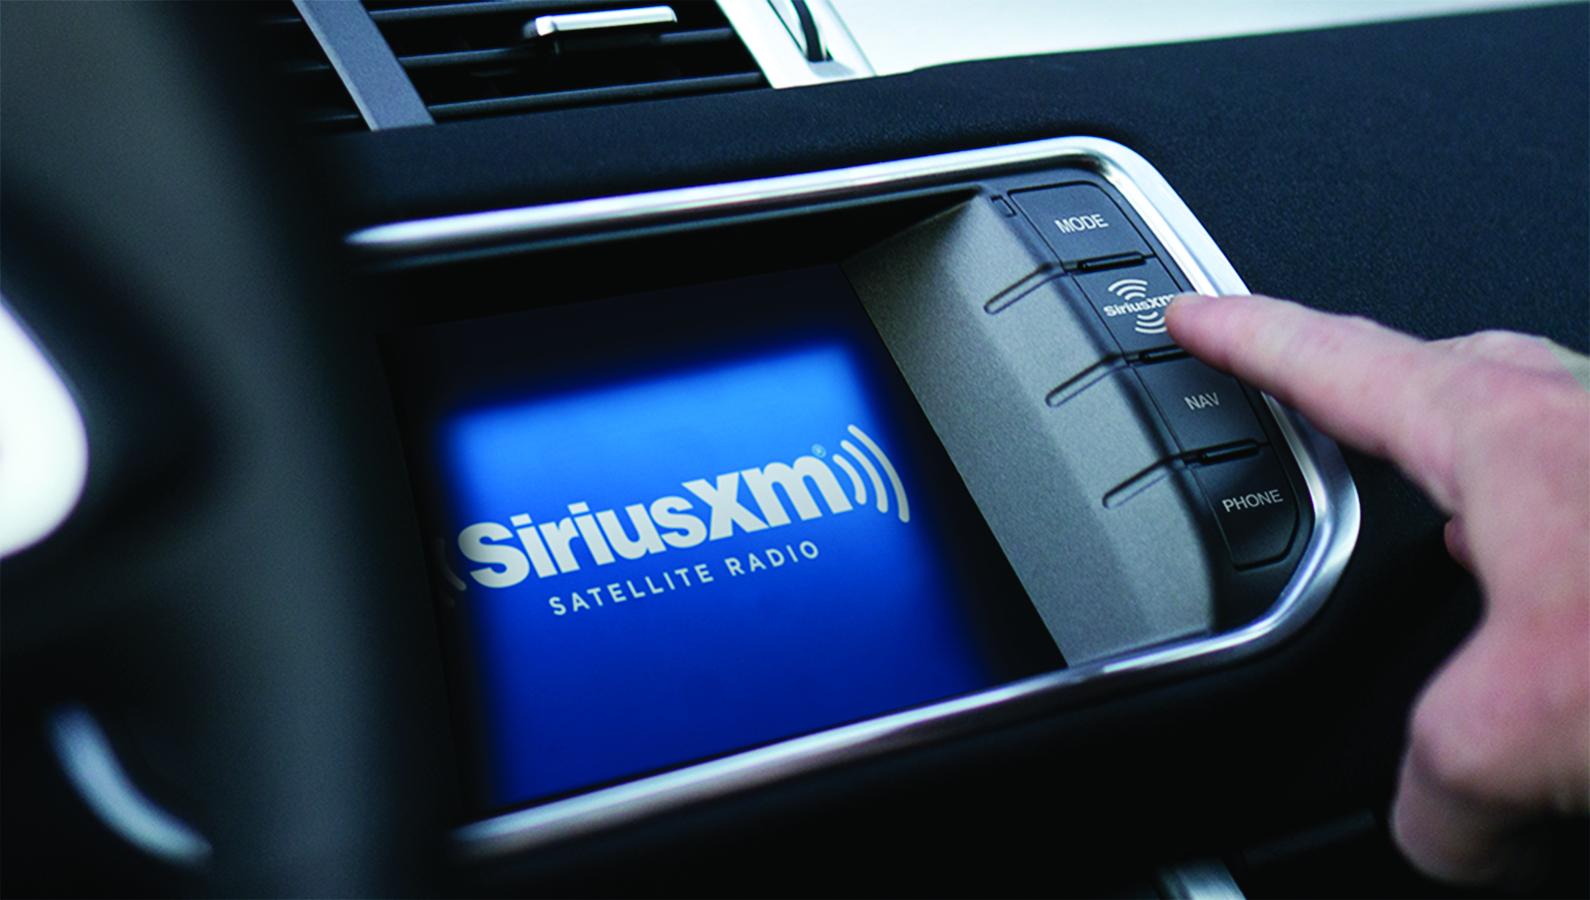 A driver pressing a button on their Sirius XM in-car radio display.